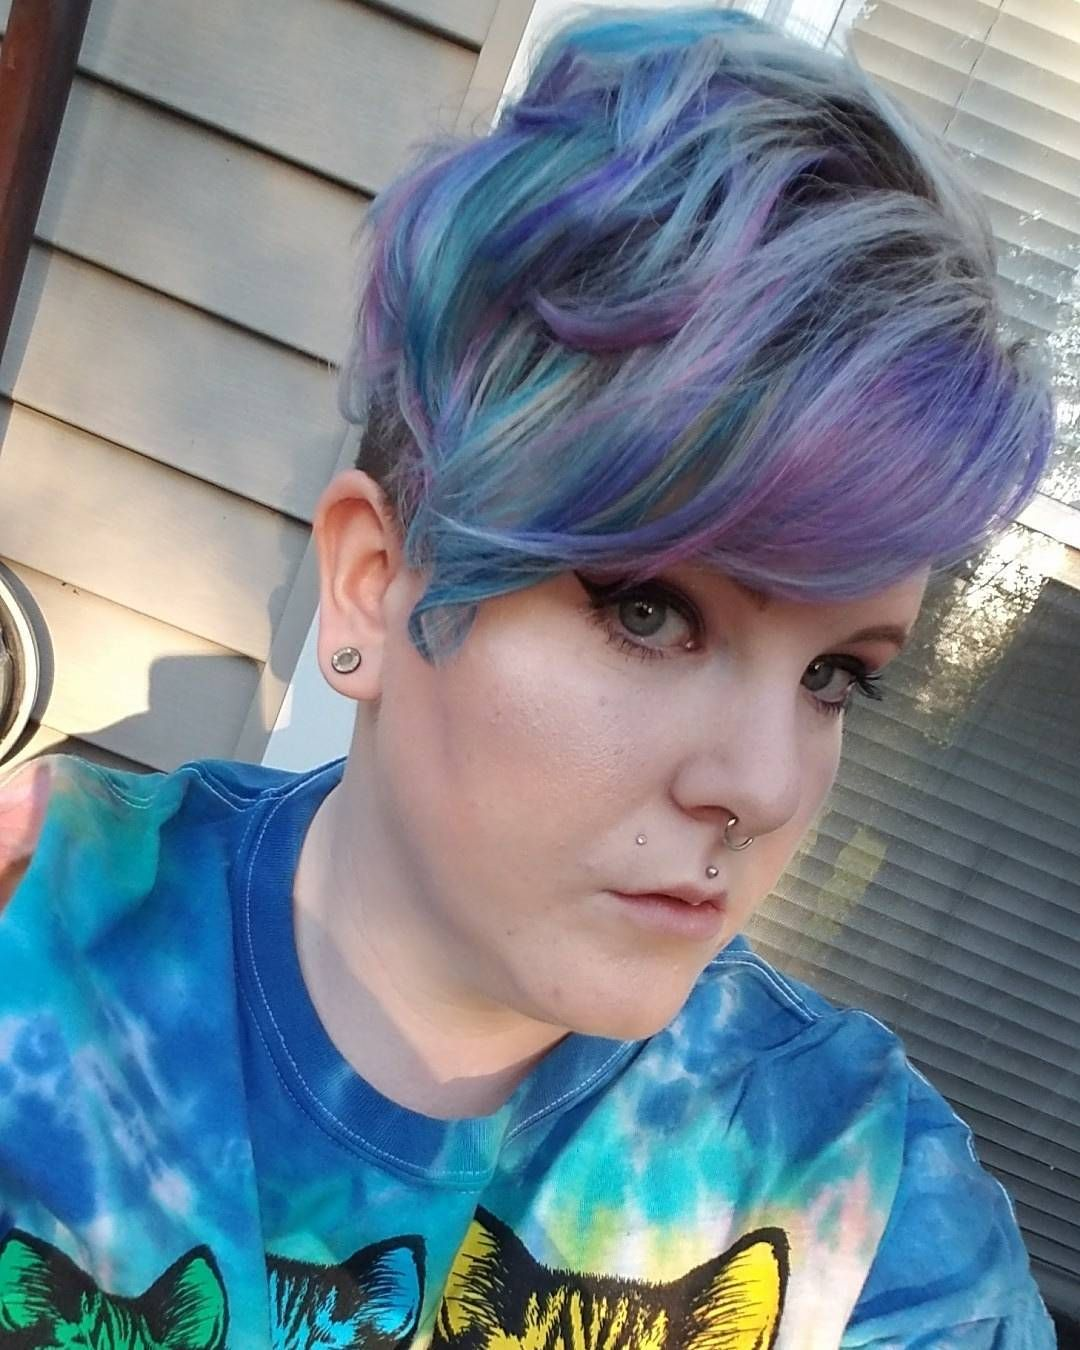 New hair haircolor nofilter unicorn unicornhair pravana